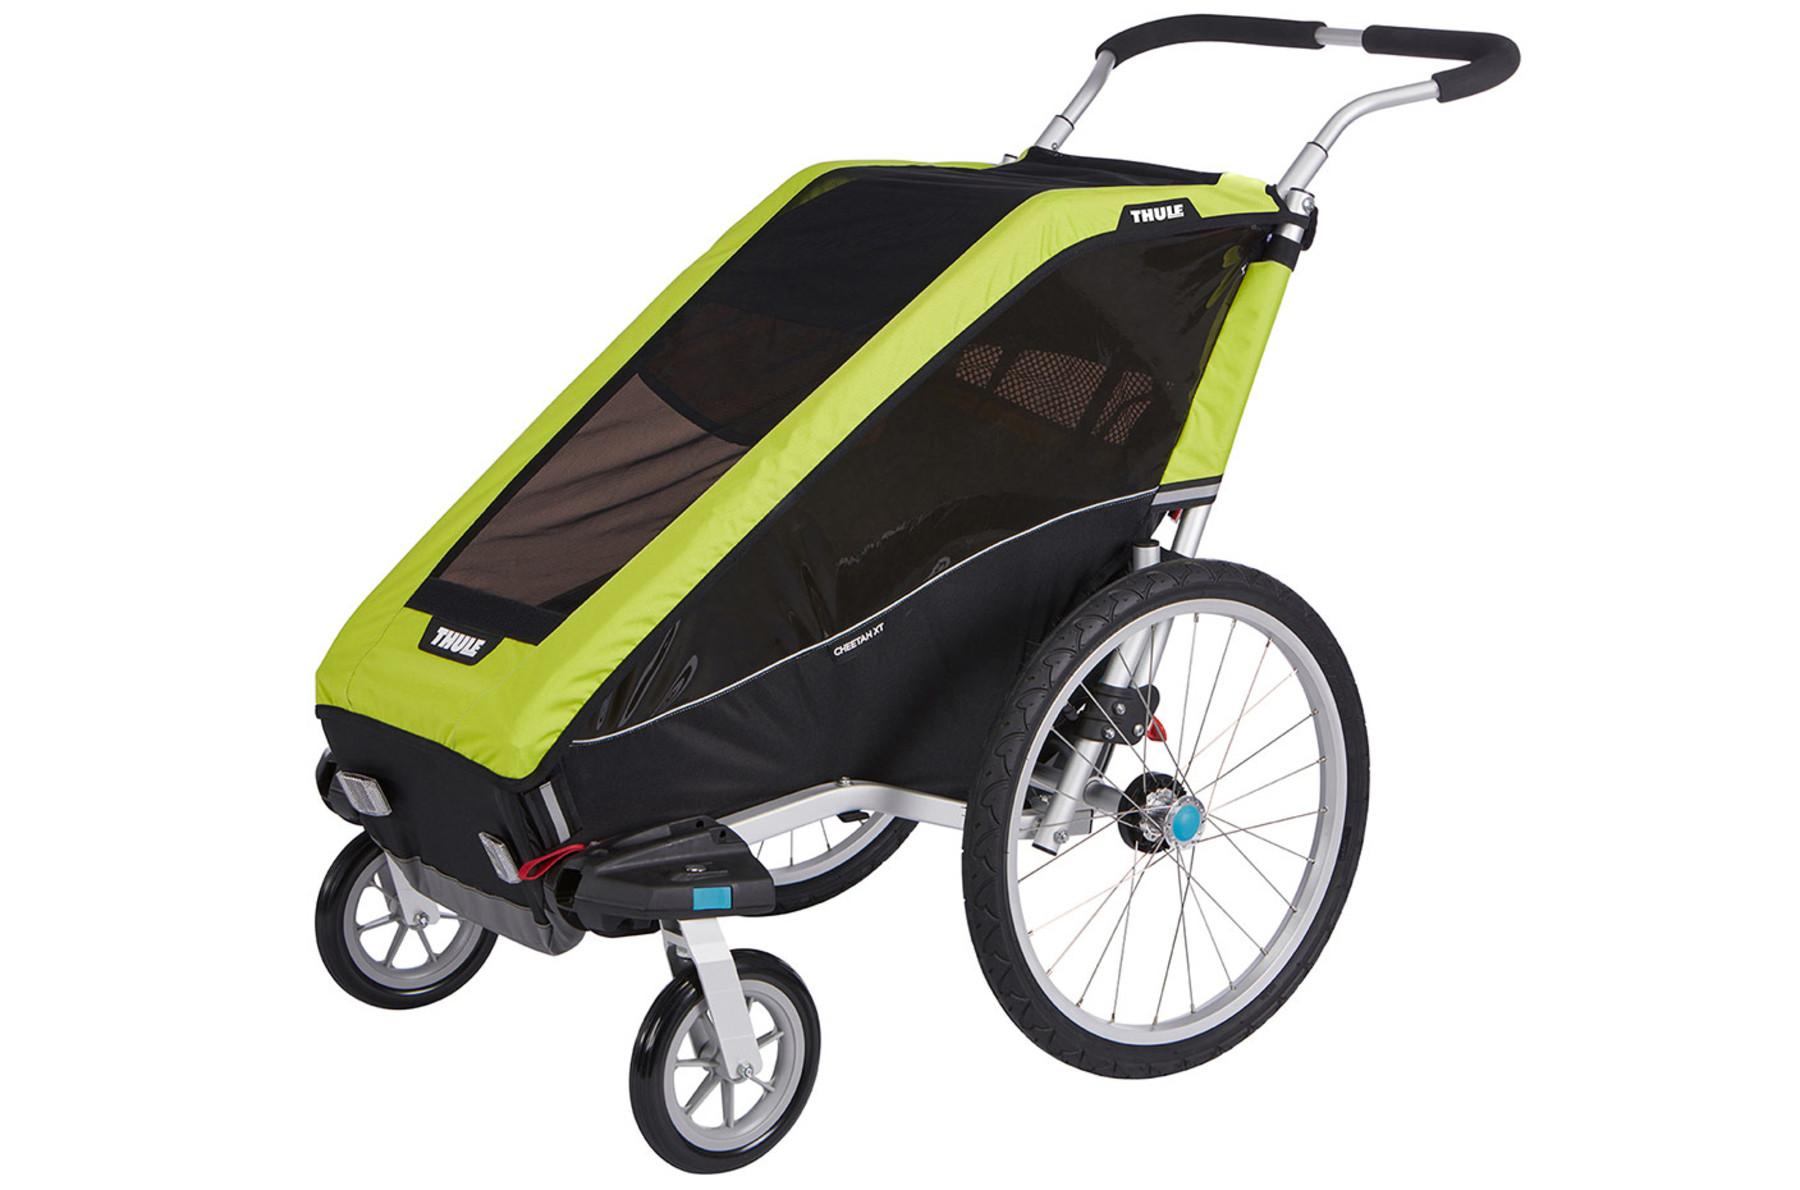 Thule Chariot Cheetah XT | E-Bikes of Holmes County LLC